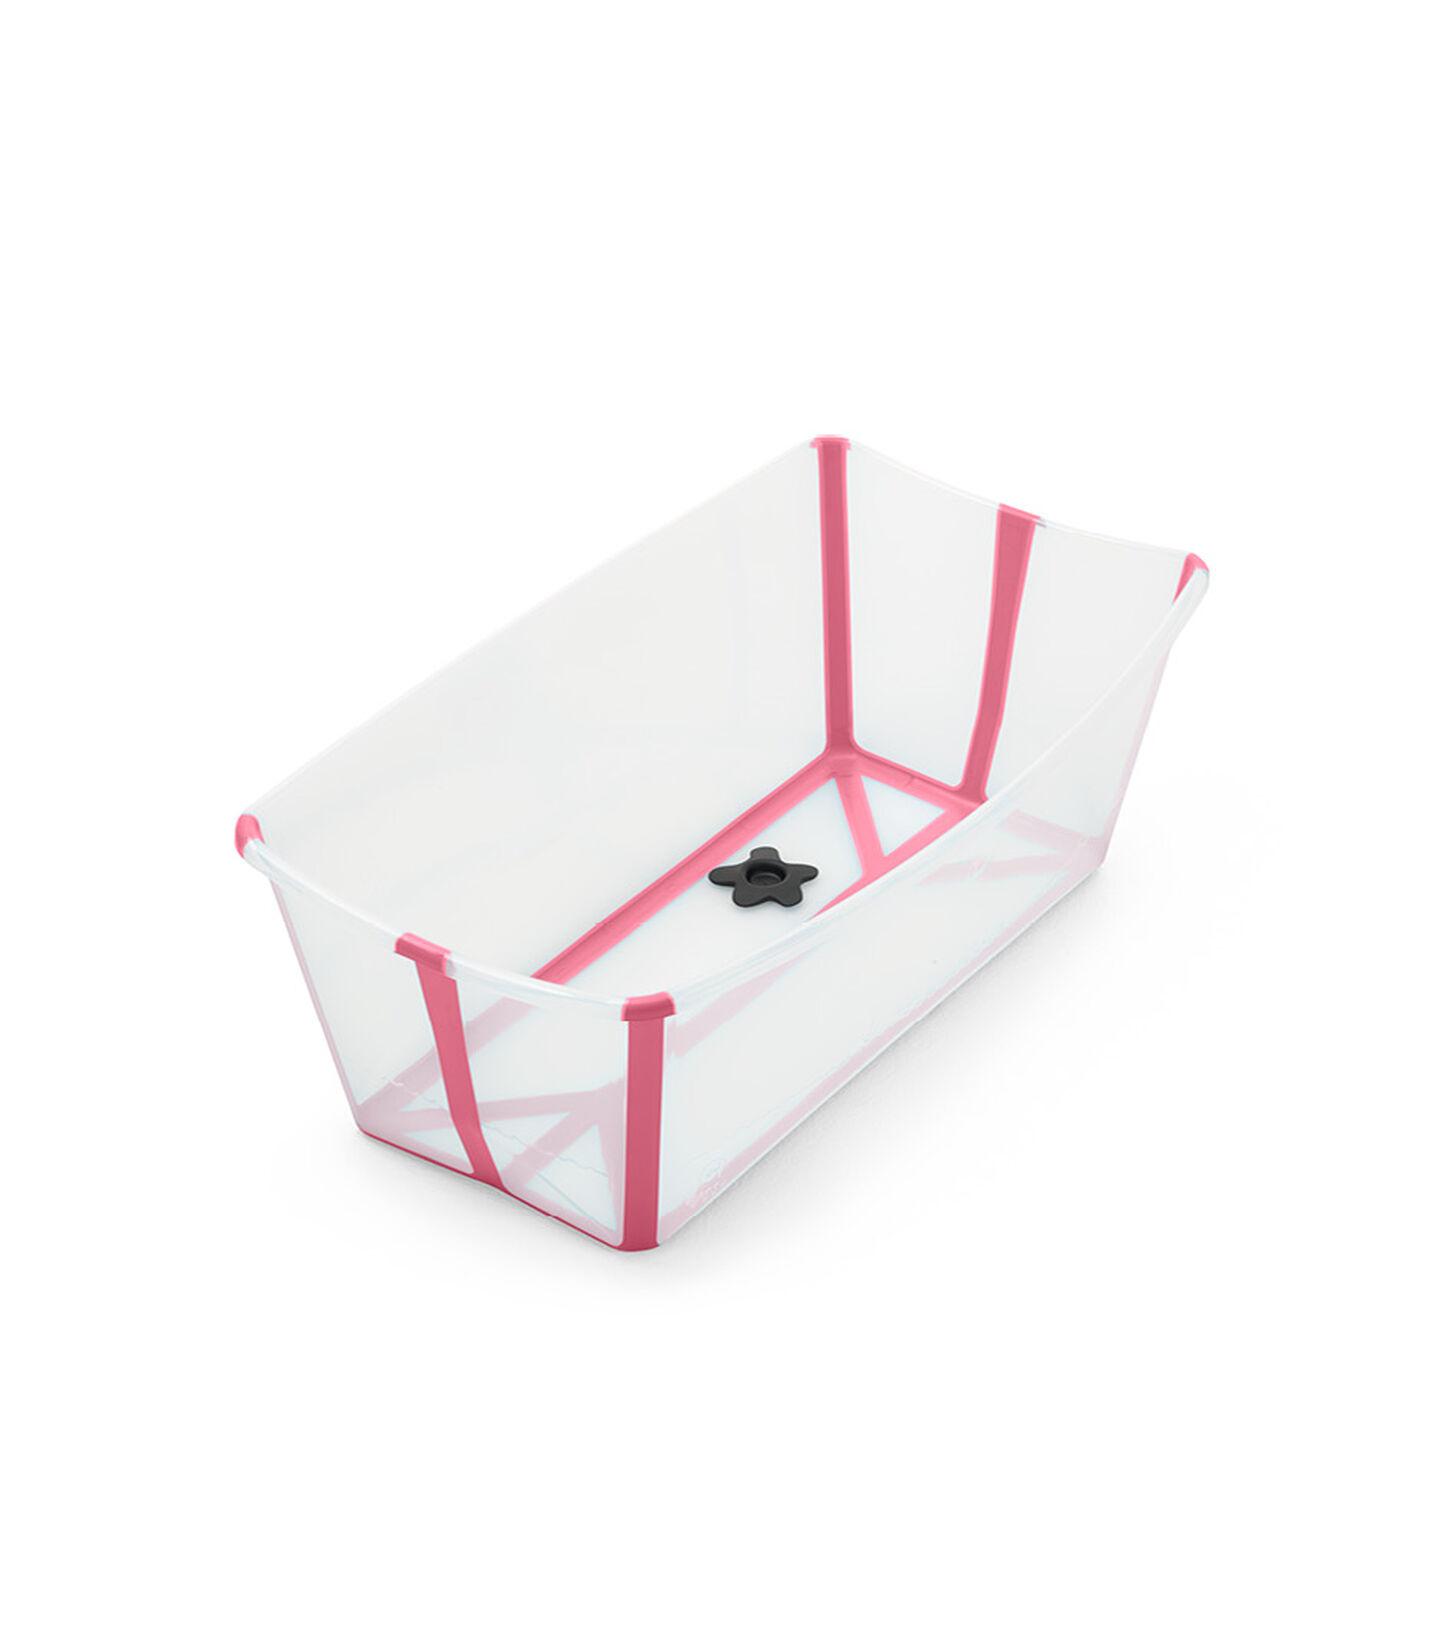 Stokke® Flexi Bath® Heat Trans Pink, Transparente Rosa, mainview view 2